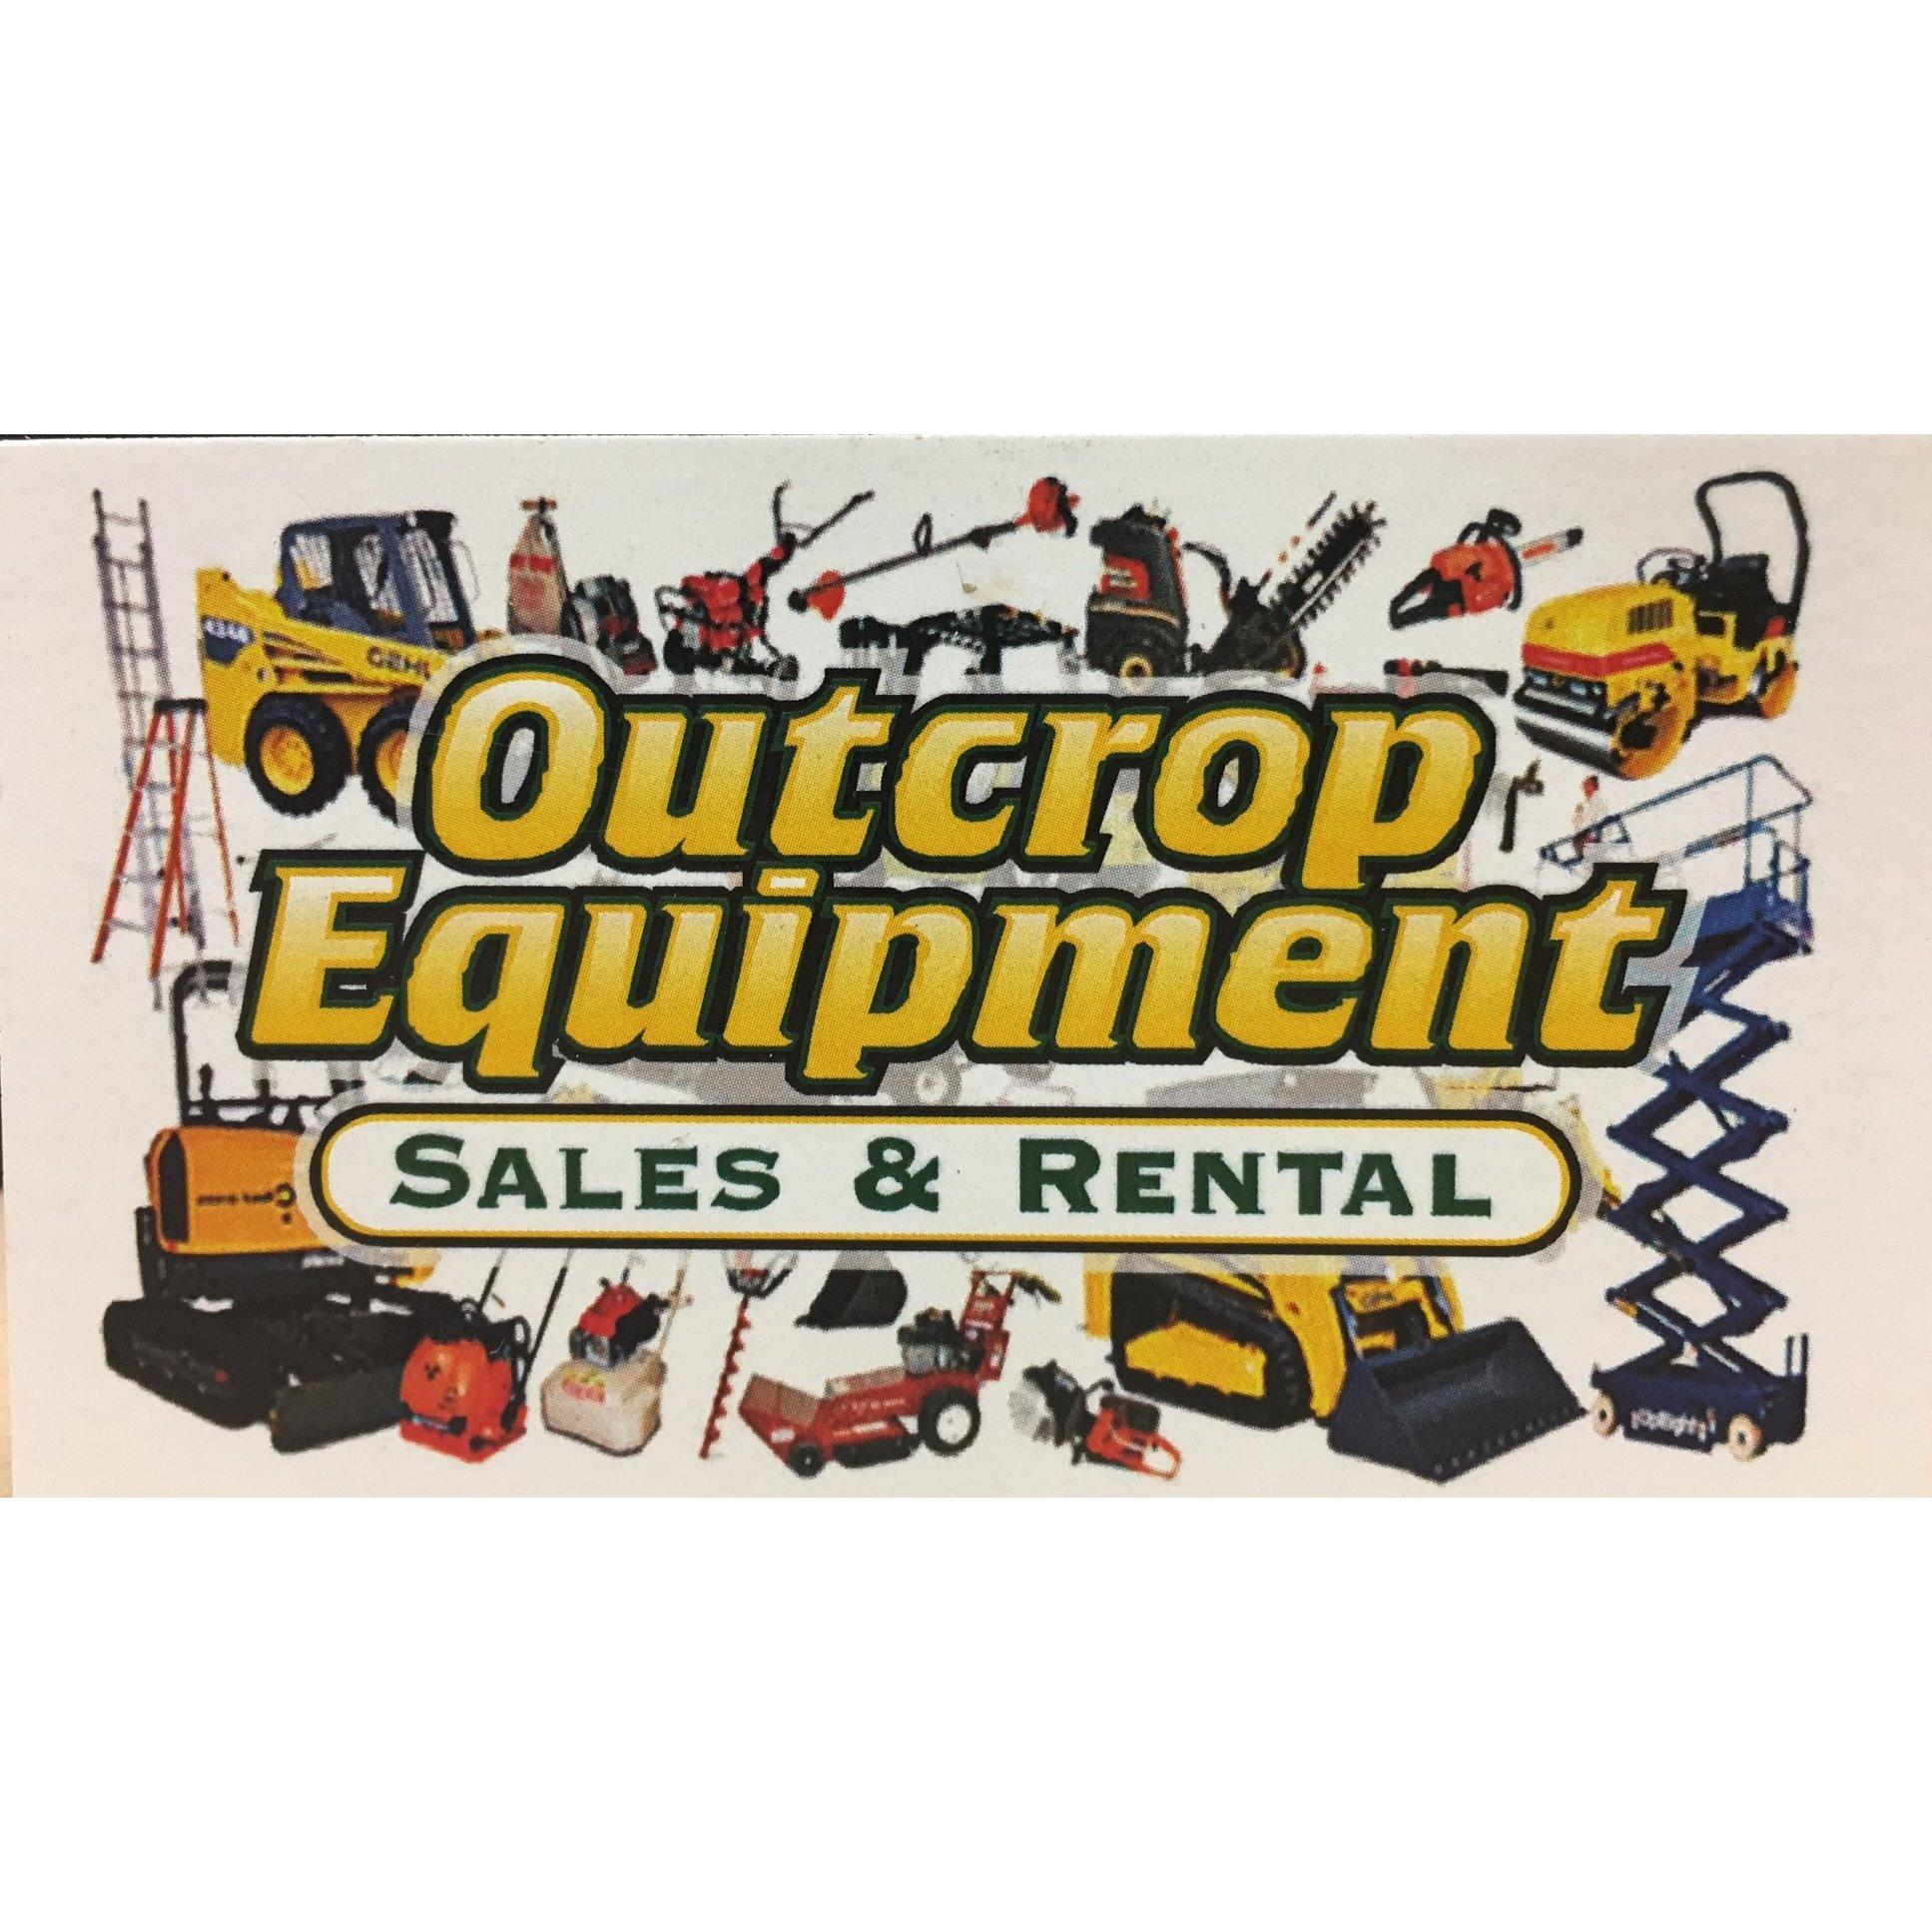 outcrop equipment sales & rental co.